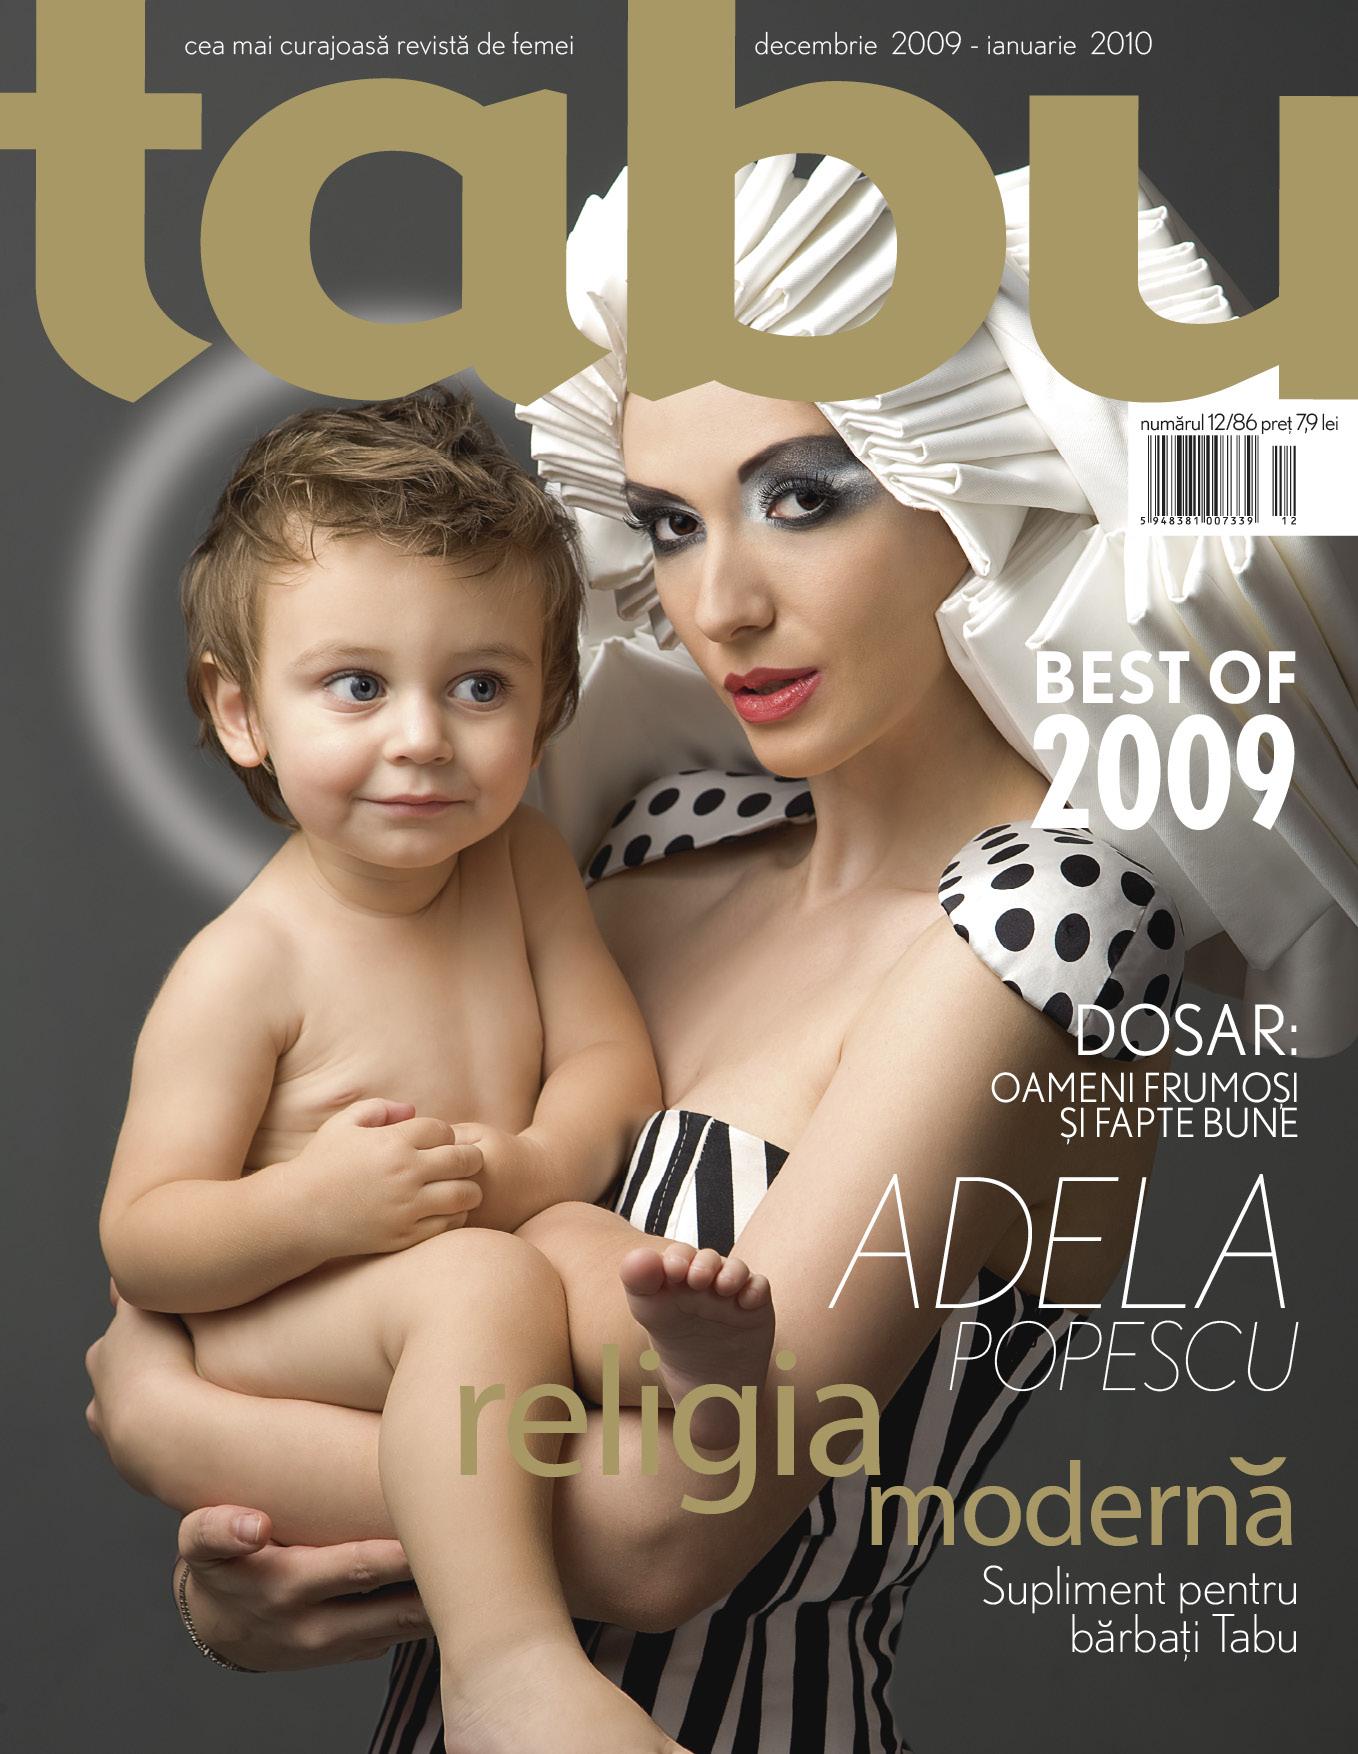 Tabu ~~ Coperta: Adela Popescu ~~ Decembrie 2009 - Ianuarie 2010